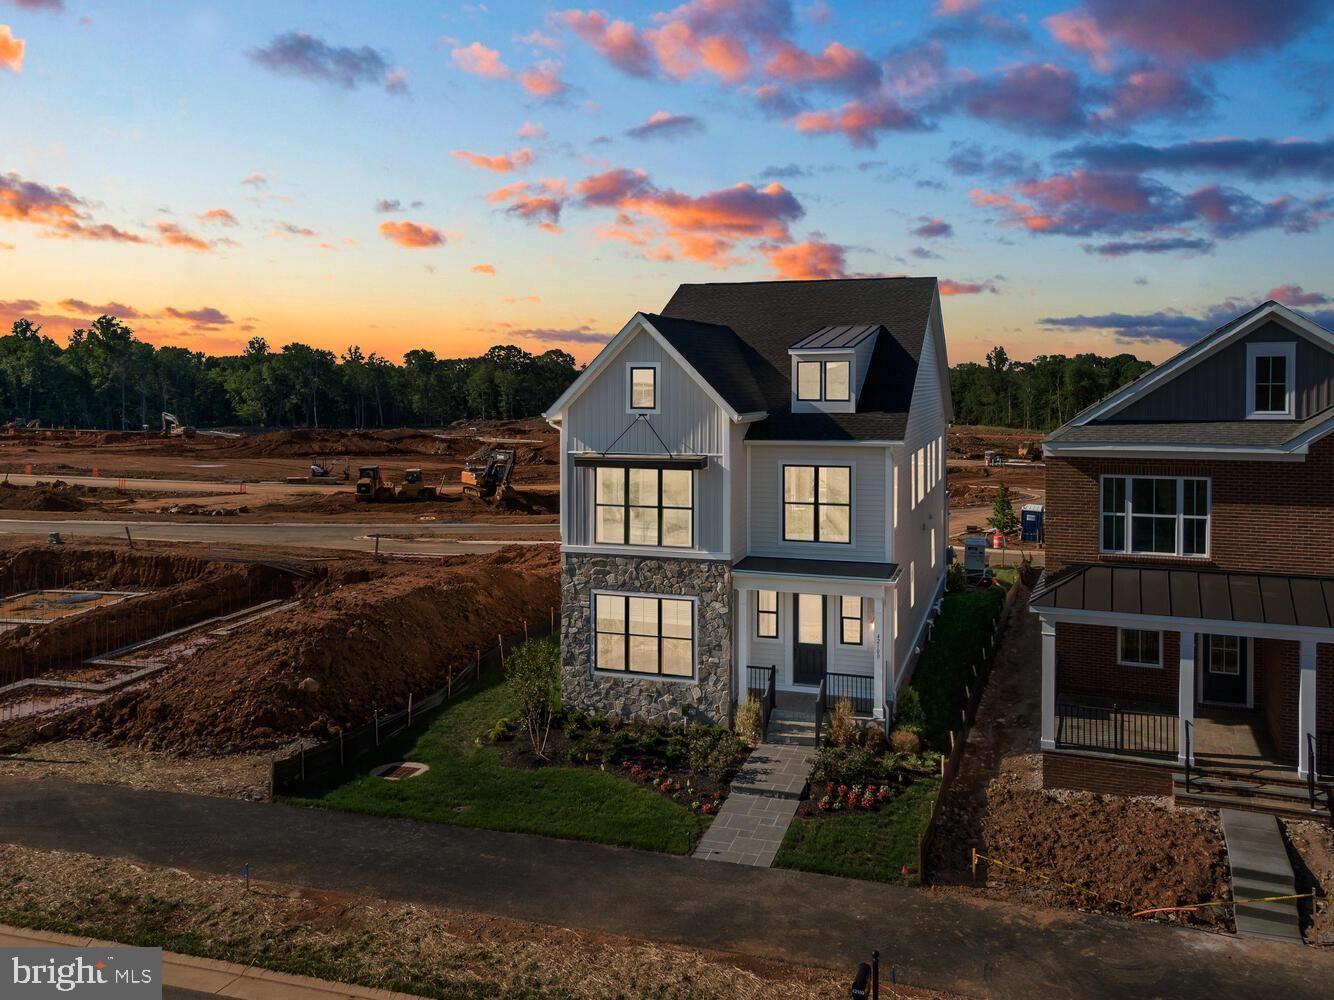 Photo of 6 CREIGHTON RD, BRAMBLETON, VA 20148 (MLS # VALO2004258)